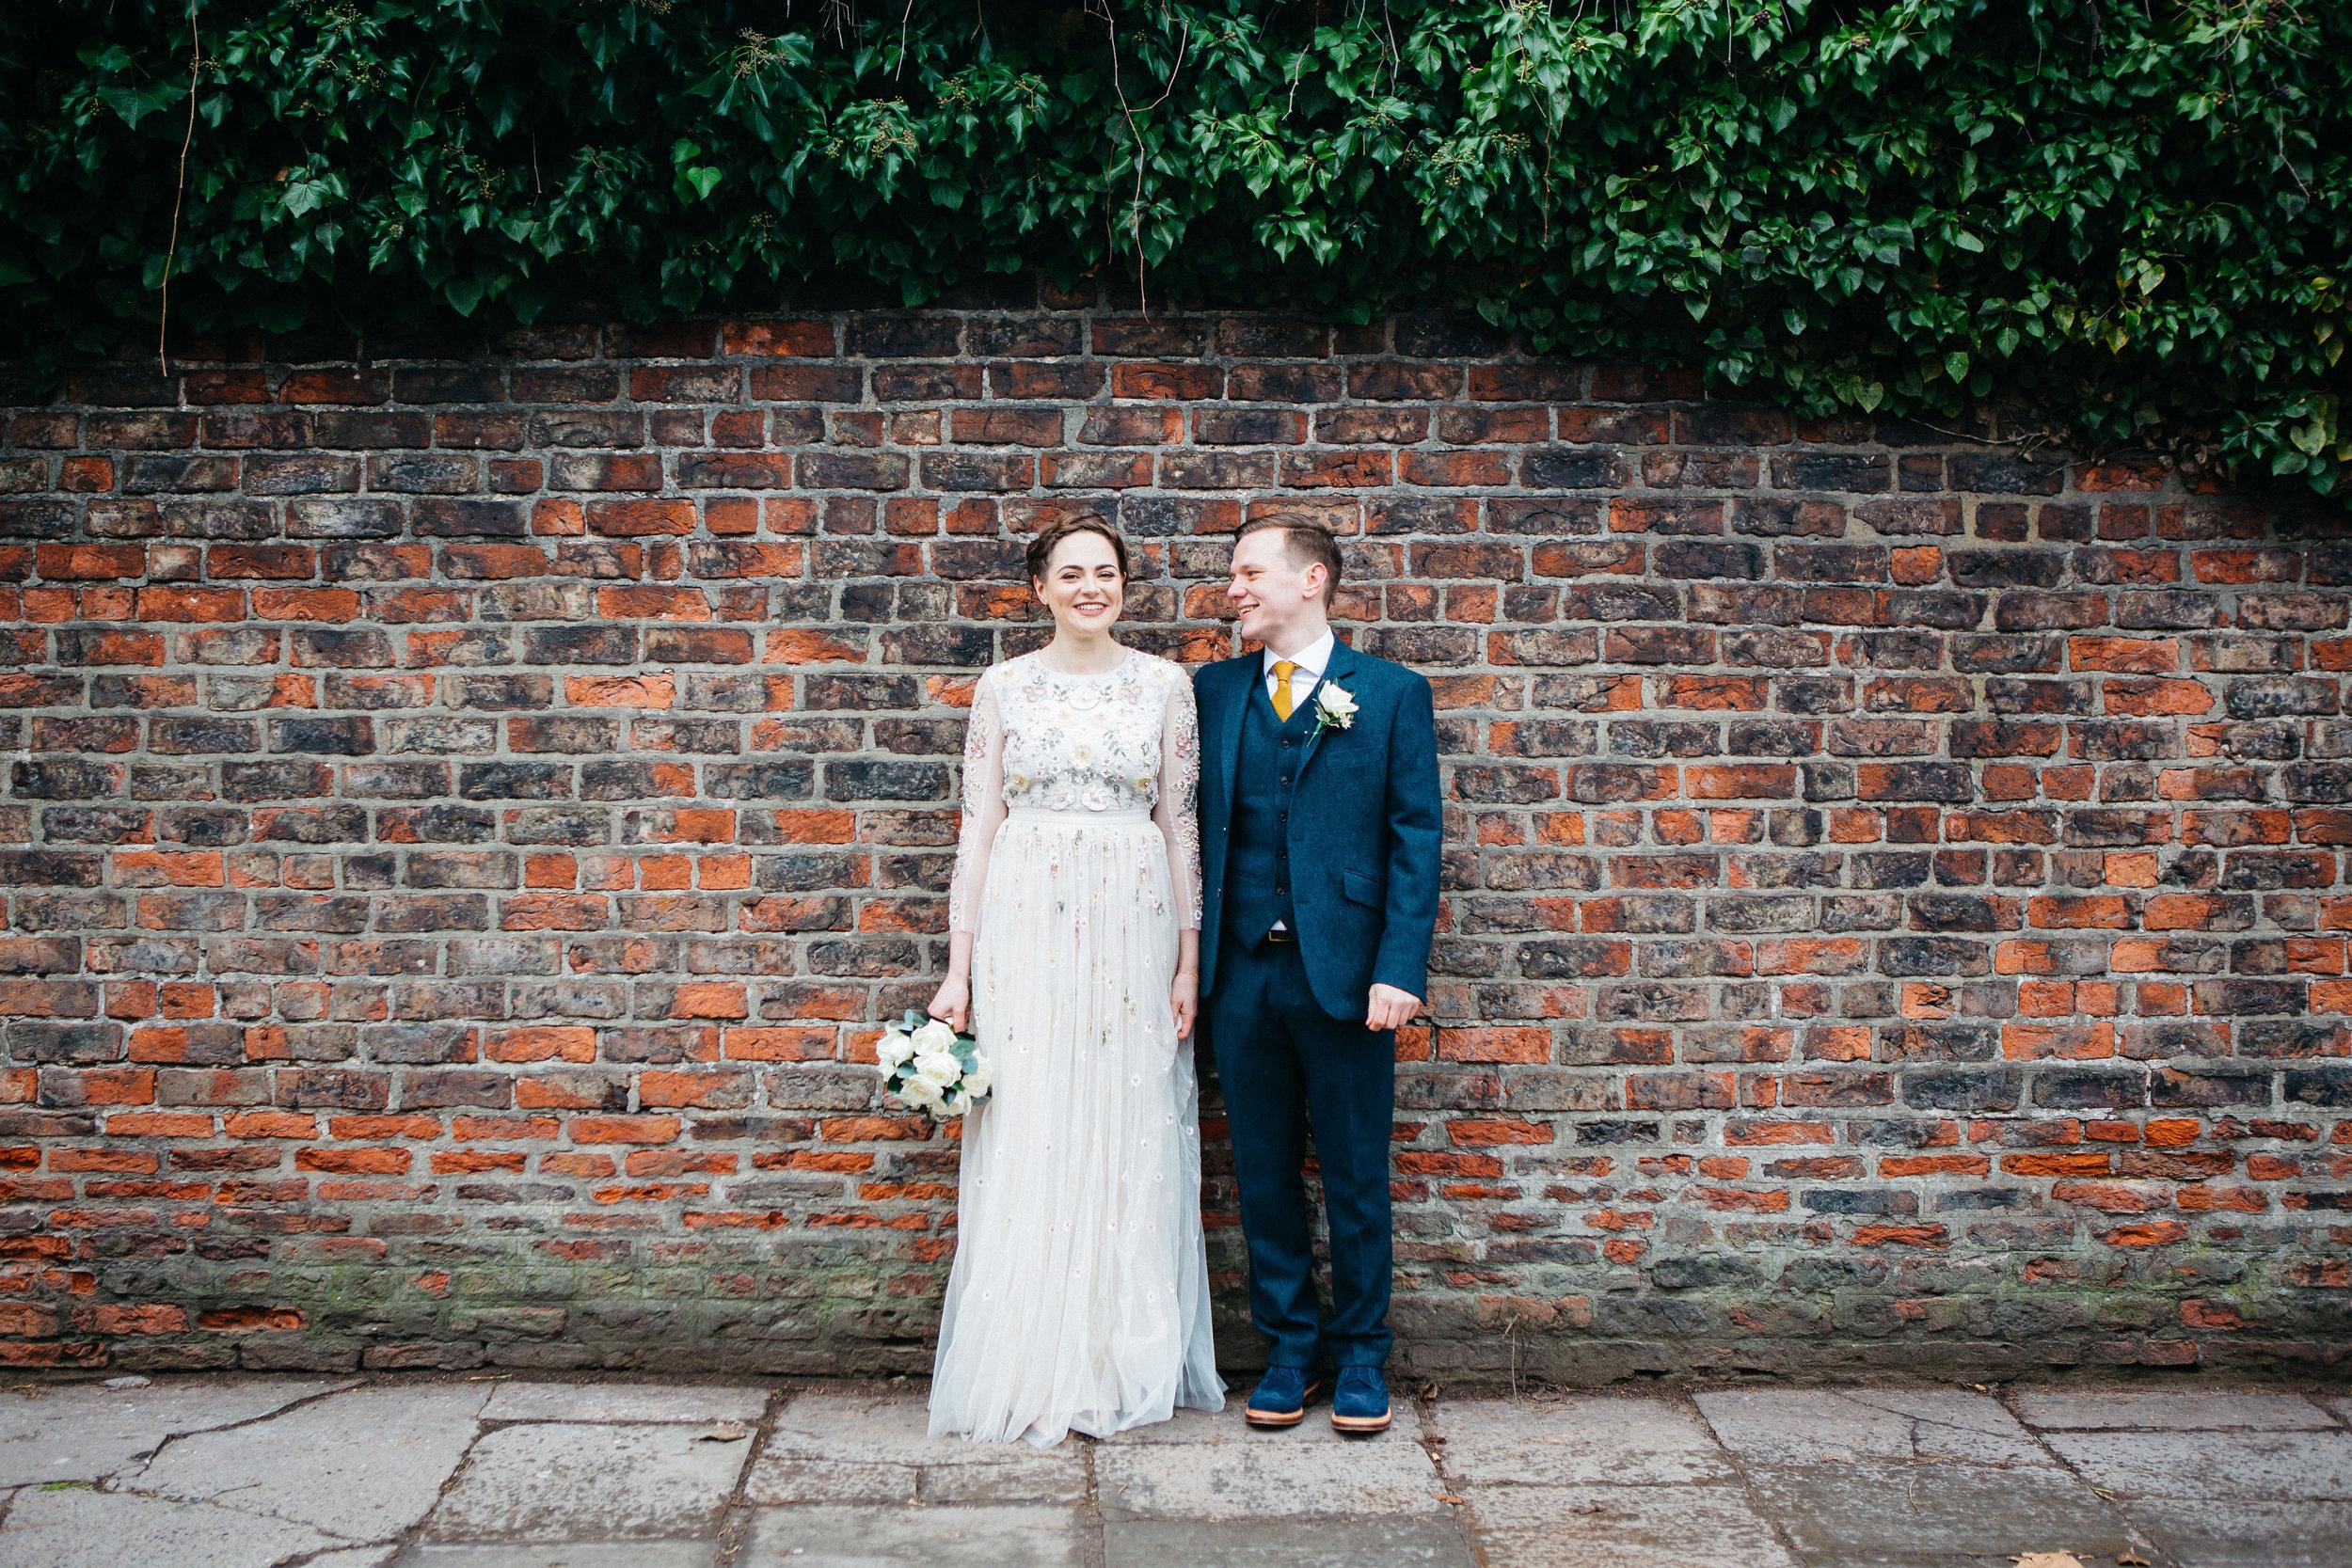 Laura & Matt wedding in York